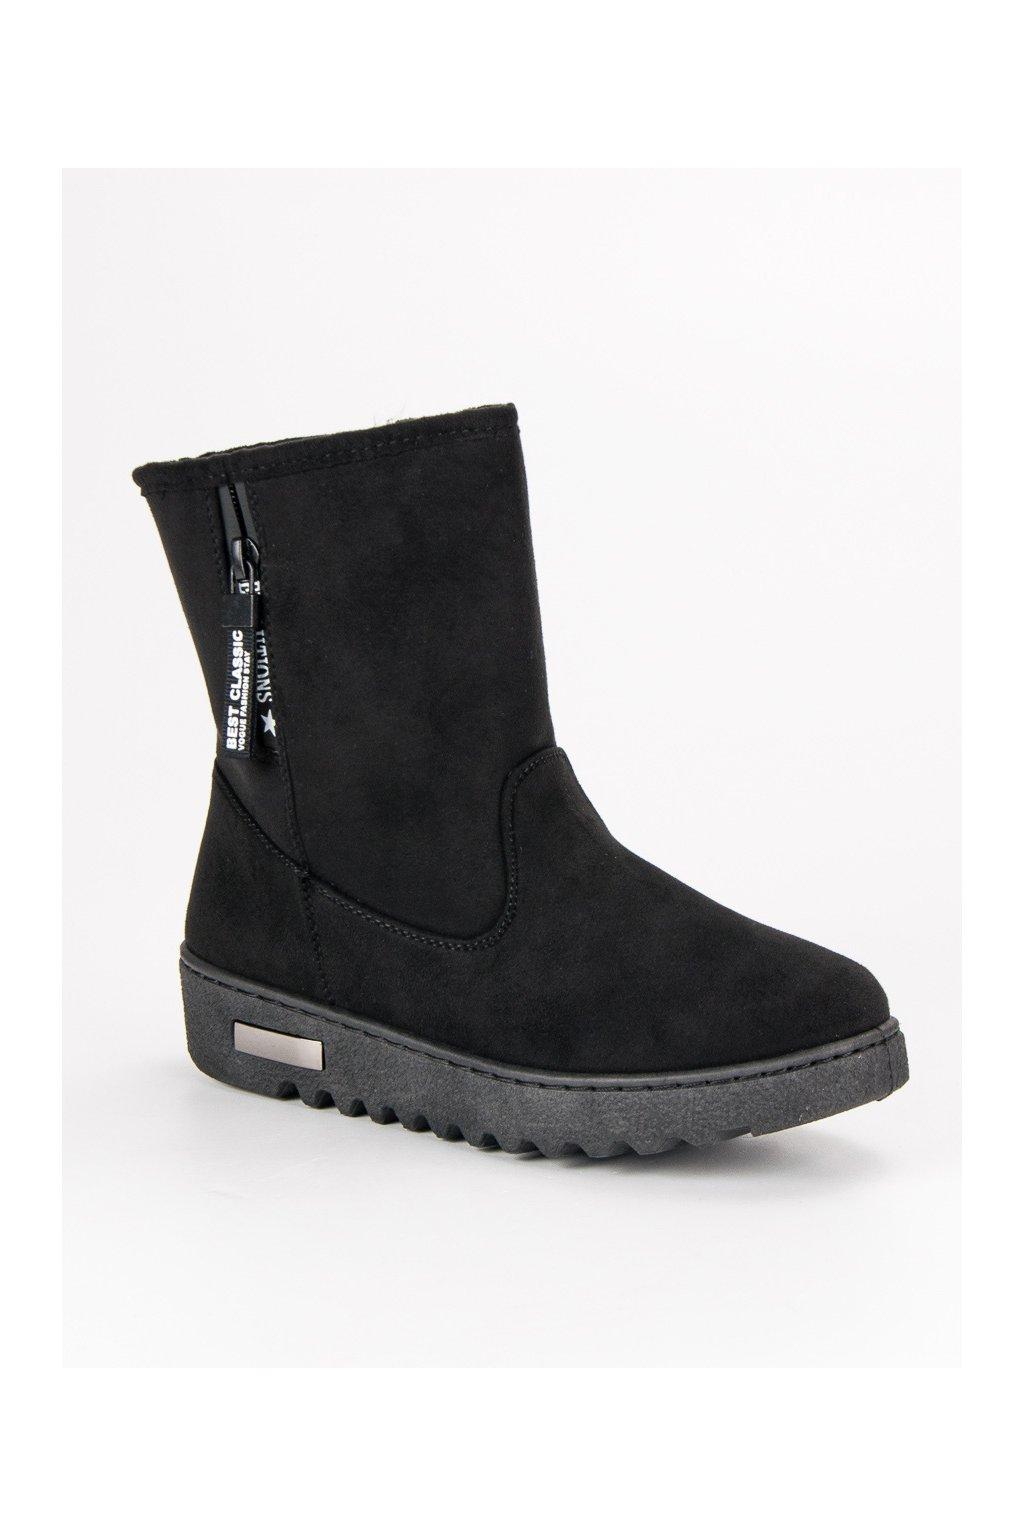 Za teplené čierne topánky semišové snehule McKeylor ANN19-14401B 4e0a0128d9e